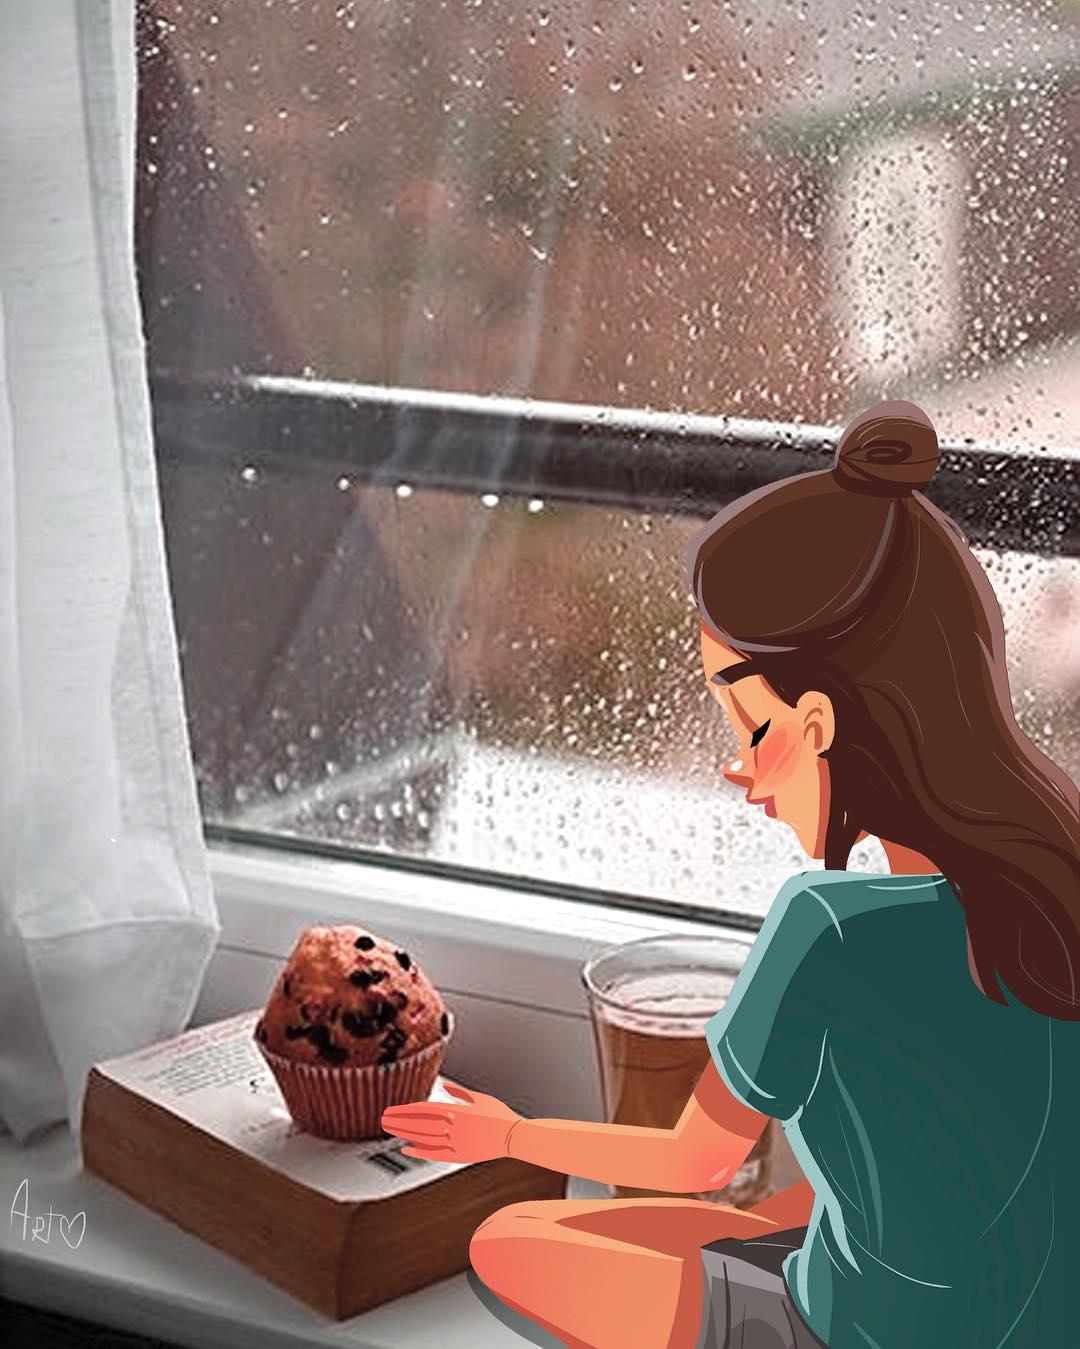 Фото Девушка сидит на окне, за которым идет дождь, by dariart. art